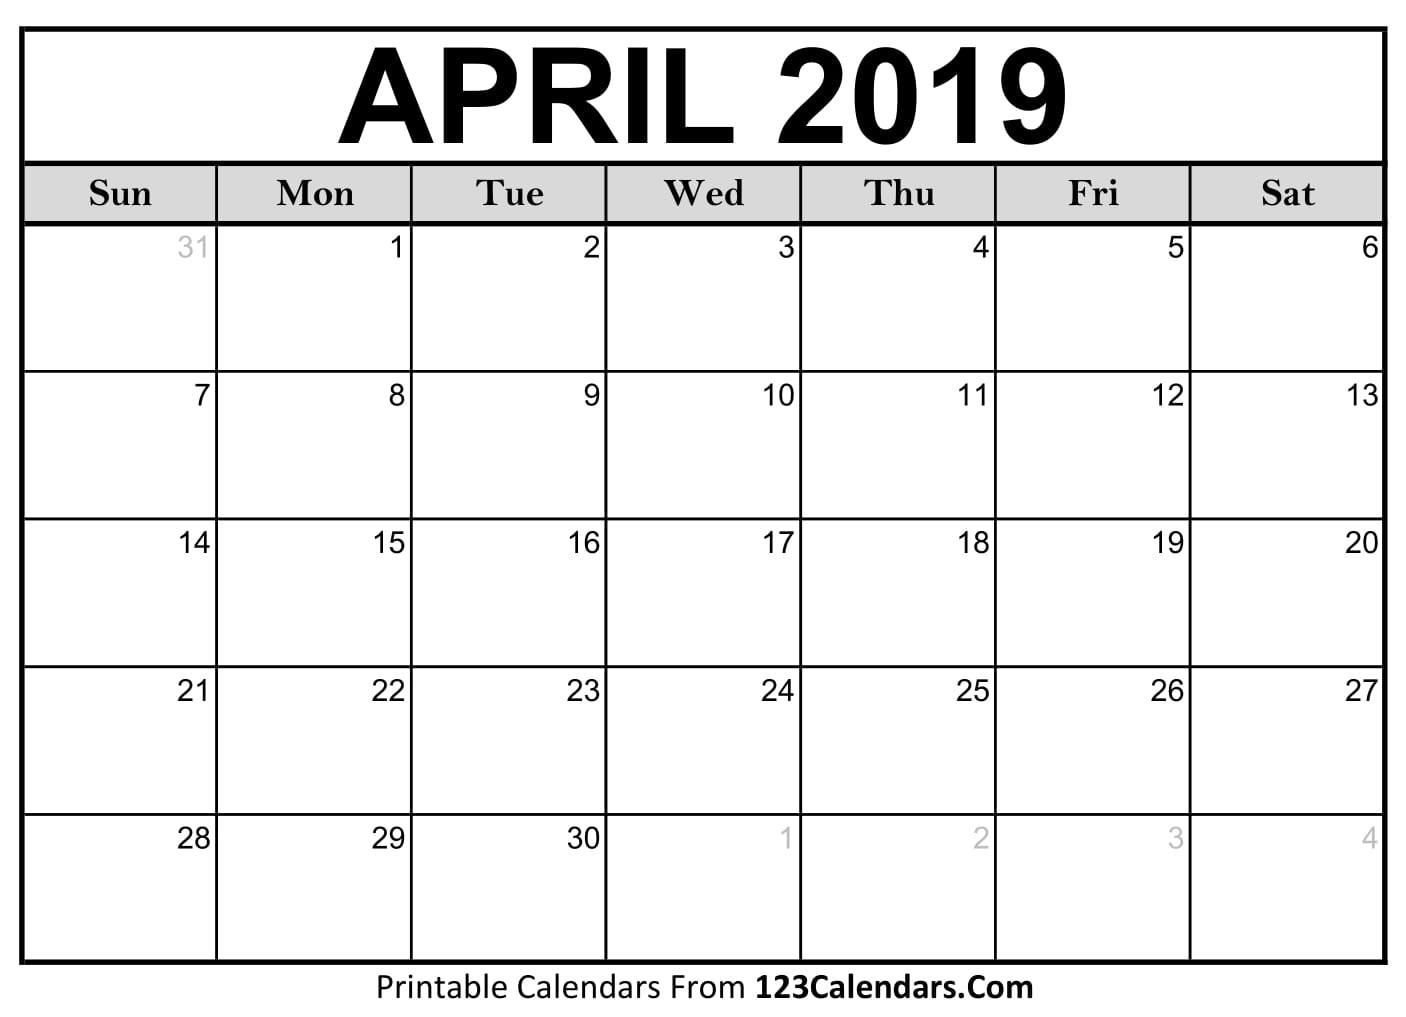 Printable April 2019 Calendar Templates 123Calendars